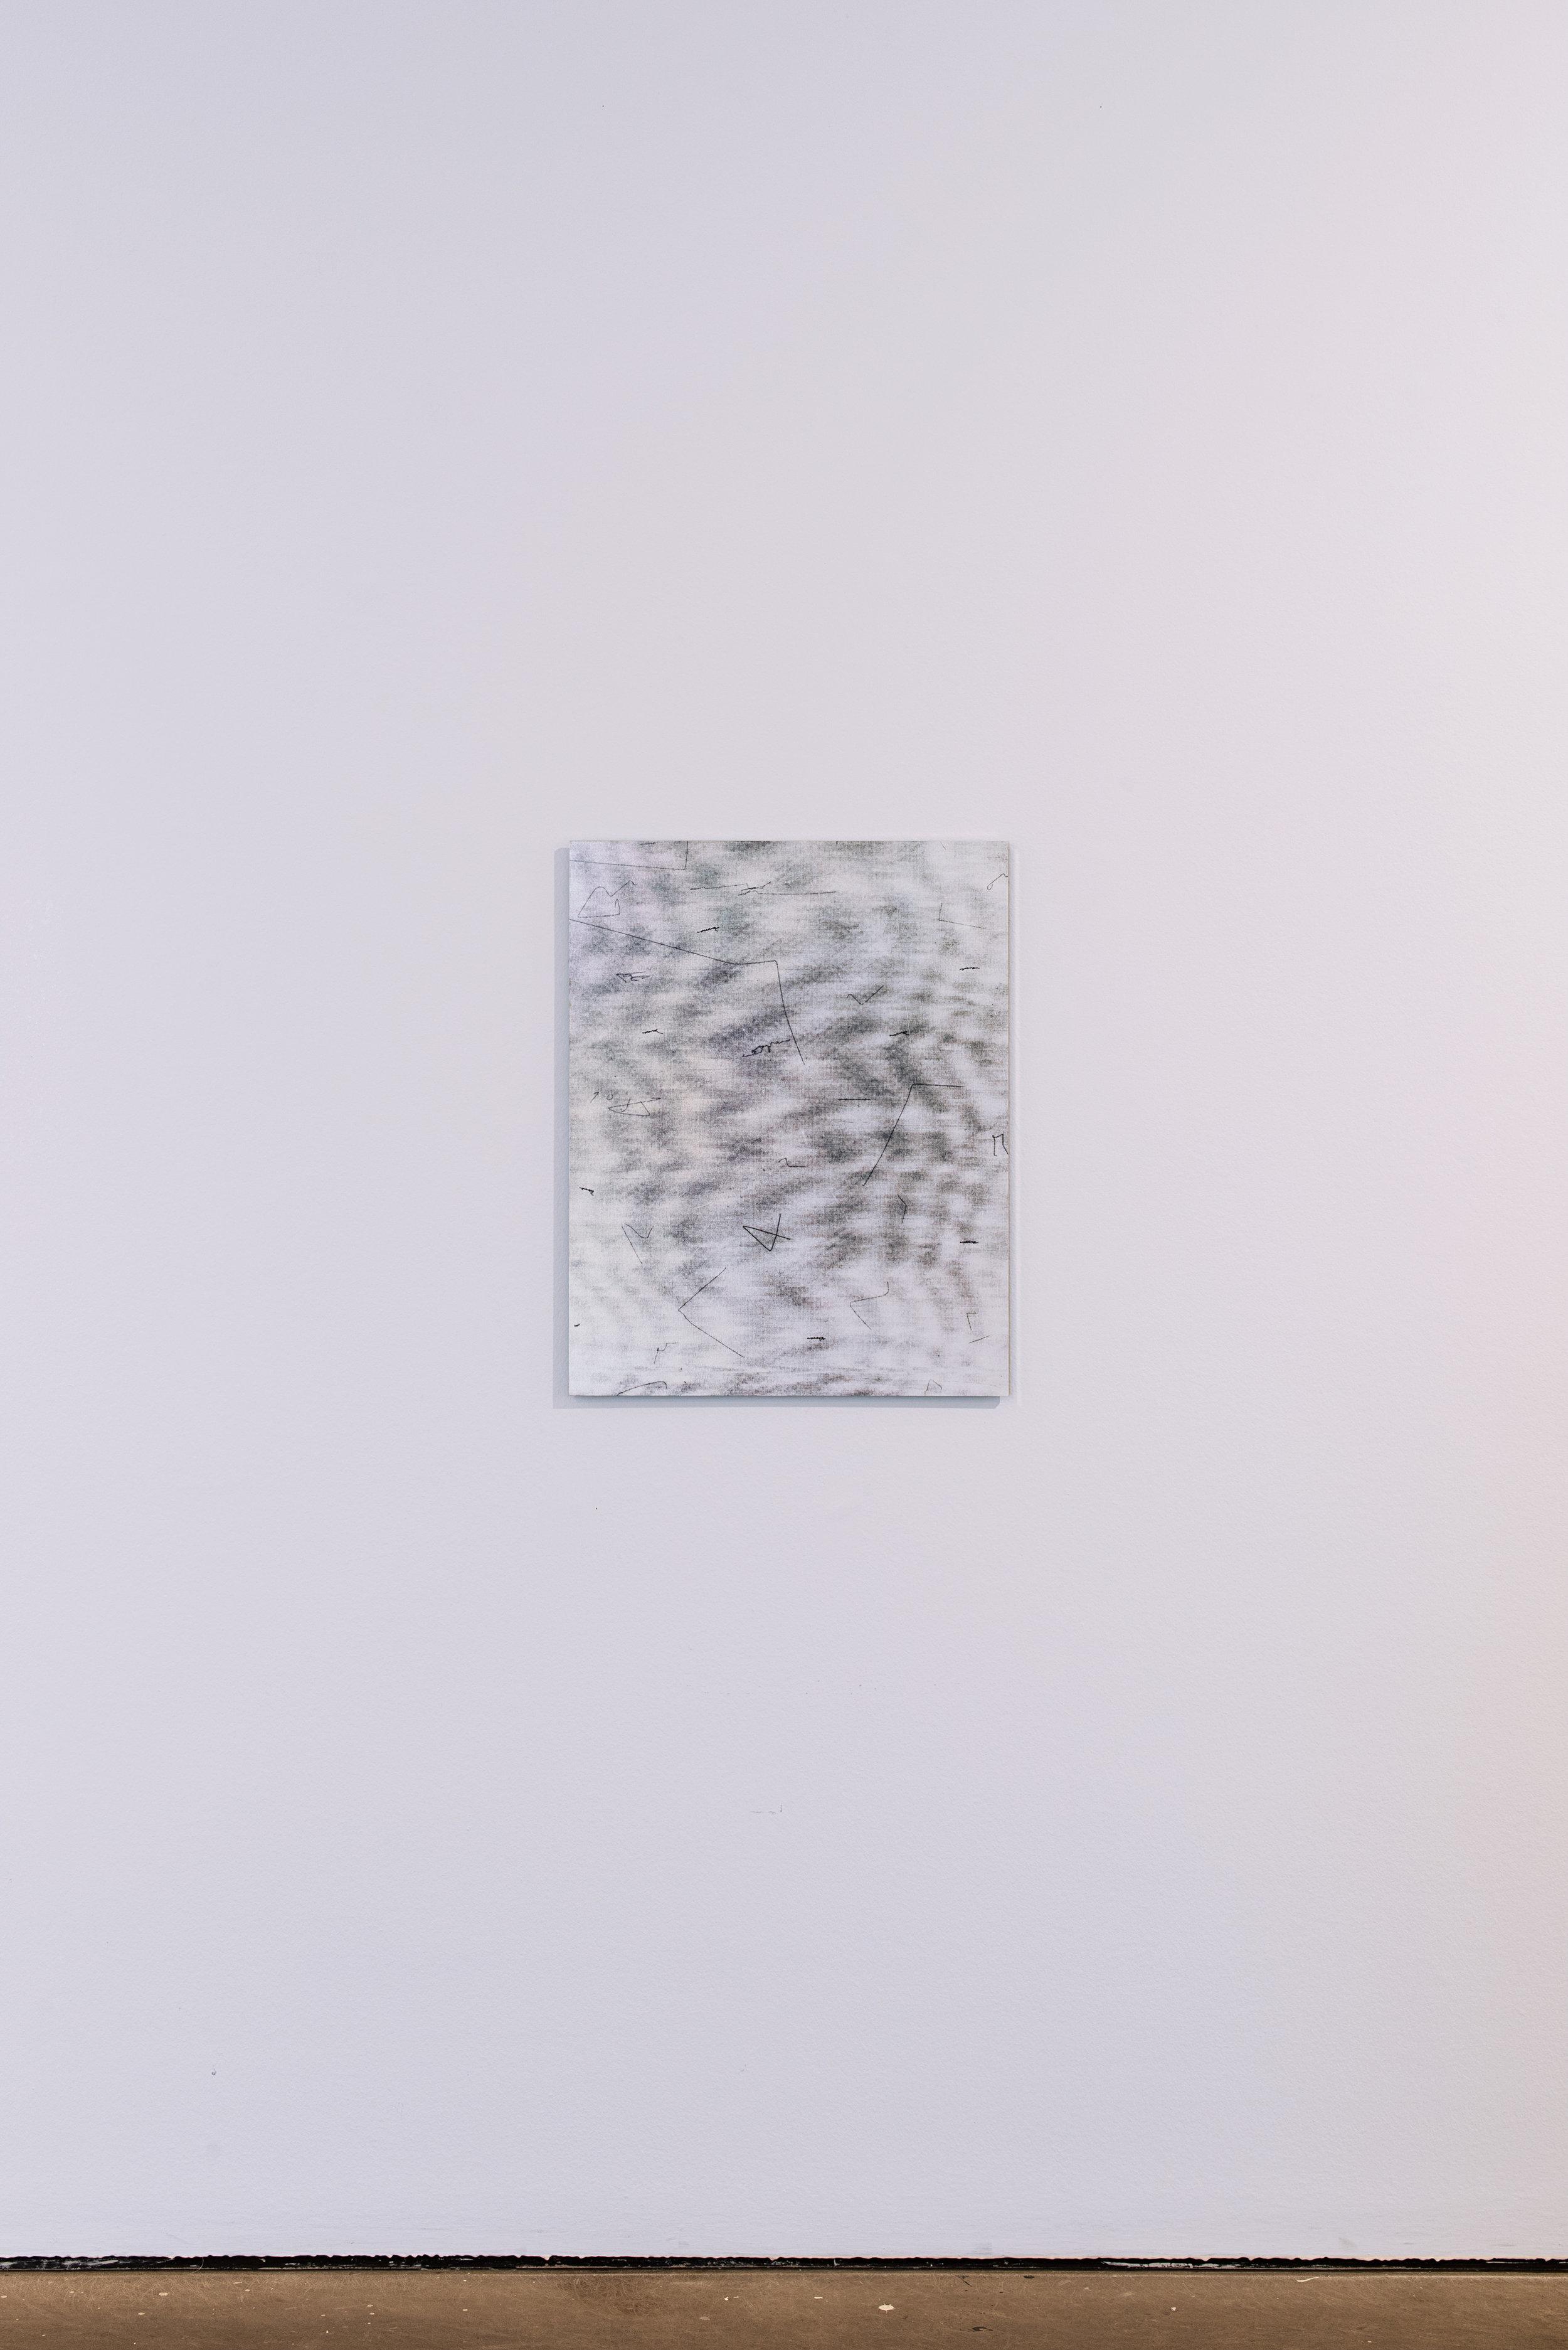 Reflex   aluminium dry-mounted hand printed analogue C-type photographic print   50 x 60 cm   2018